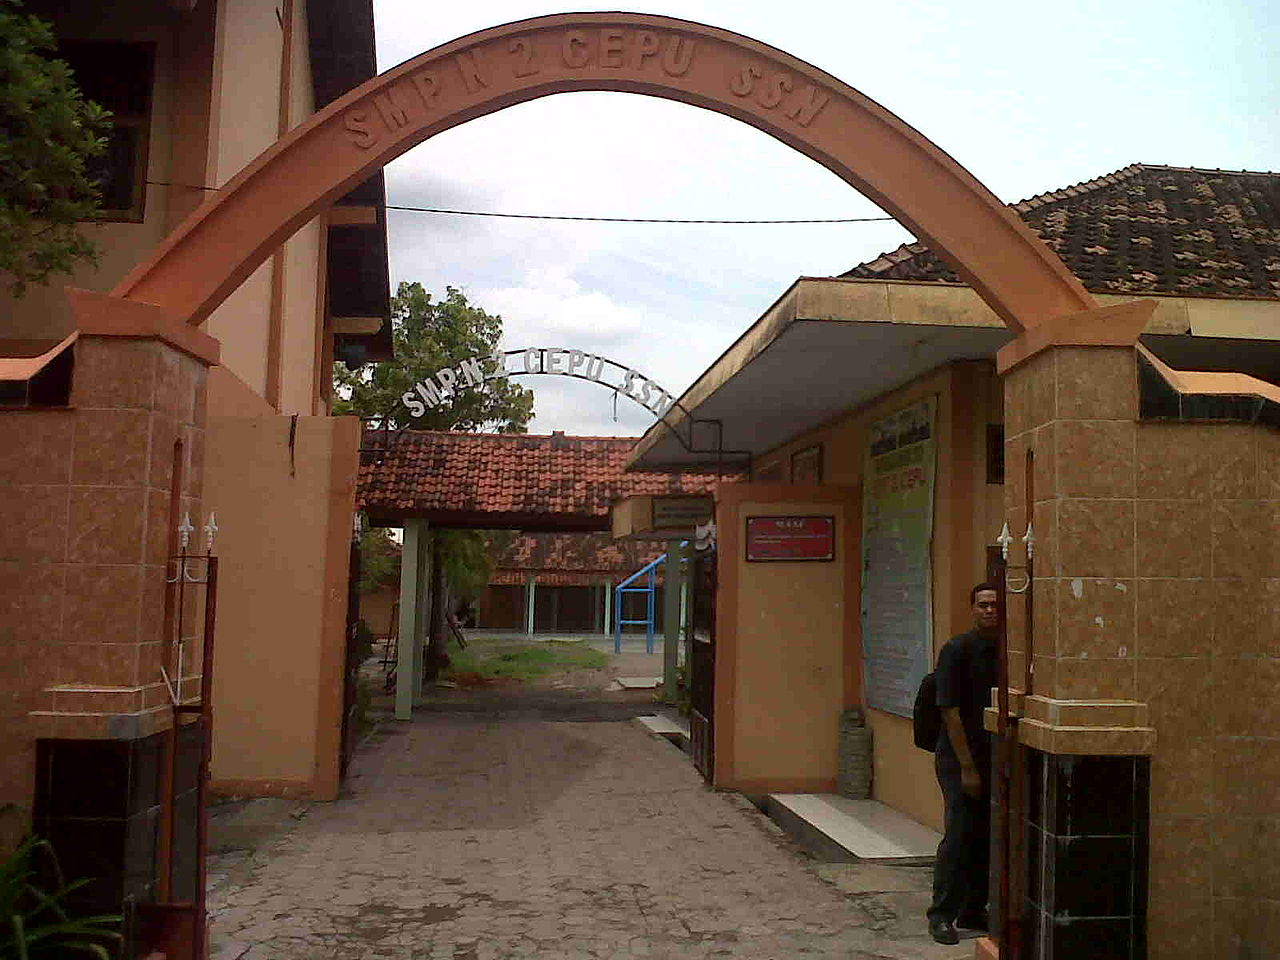 Cepu Indonesia  city images : SMP N 2 Cepu Blora Jawa Tengah Indonesia Wikimedia Commons